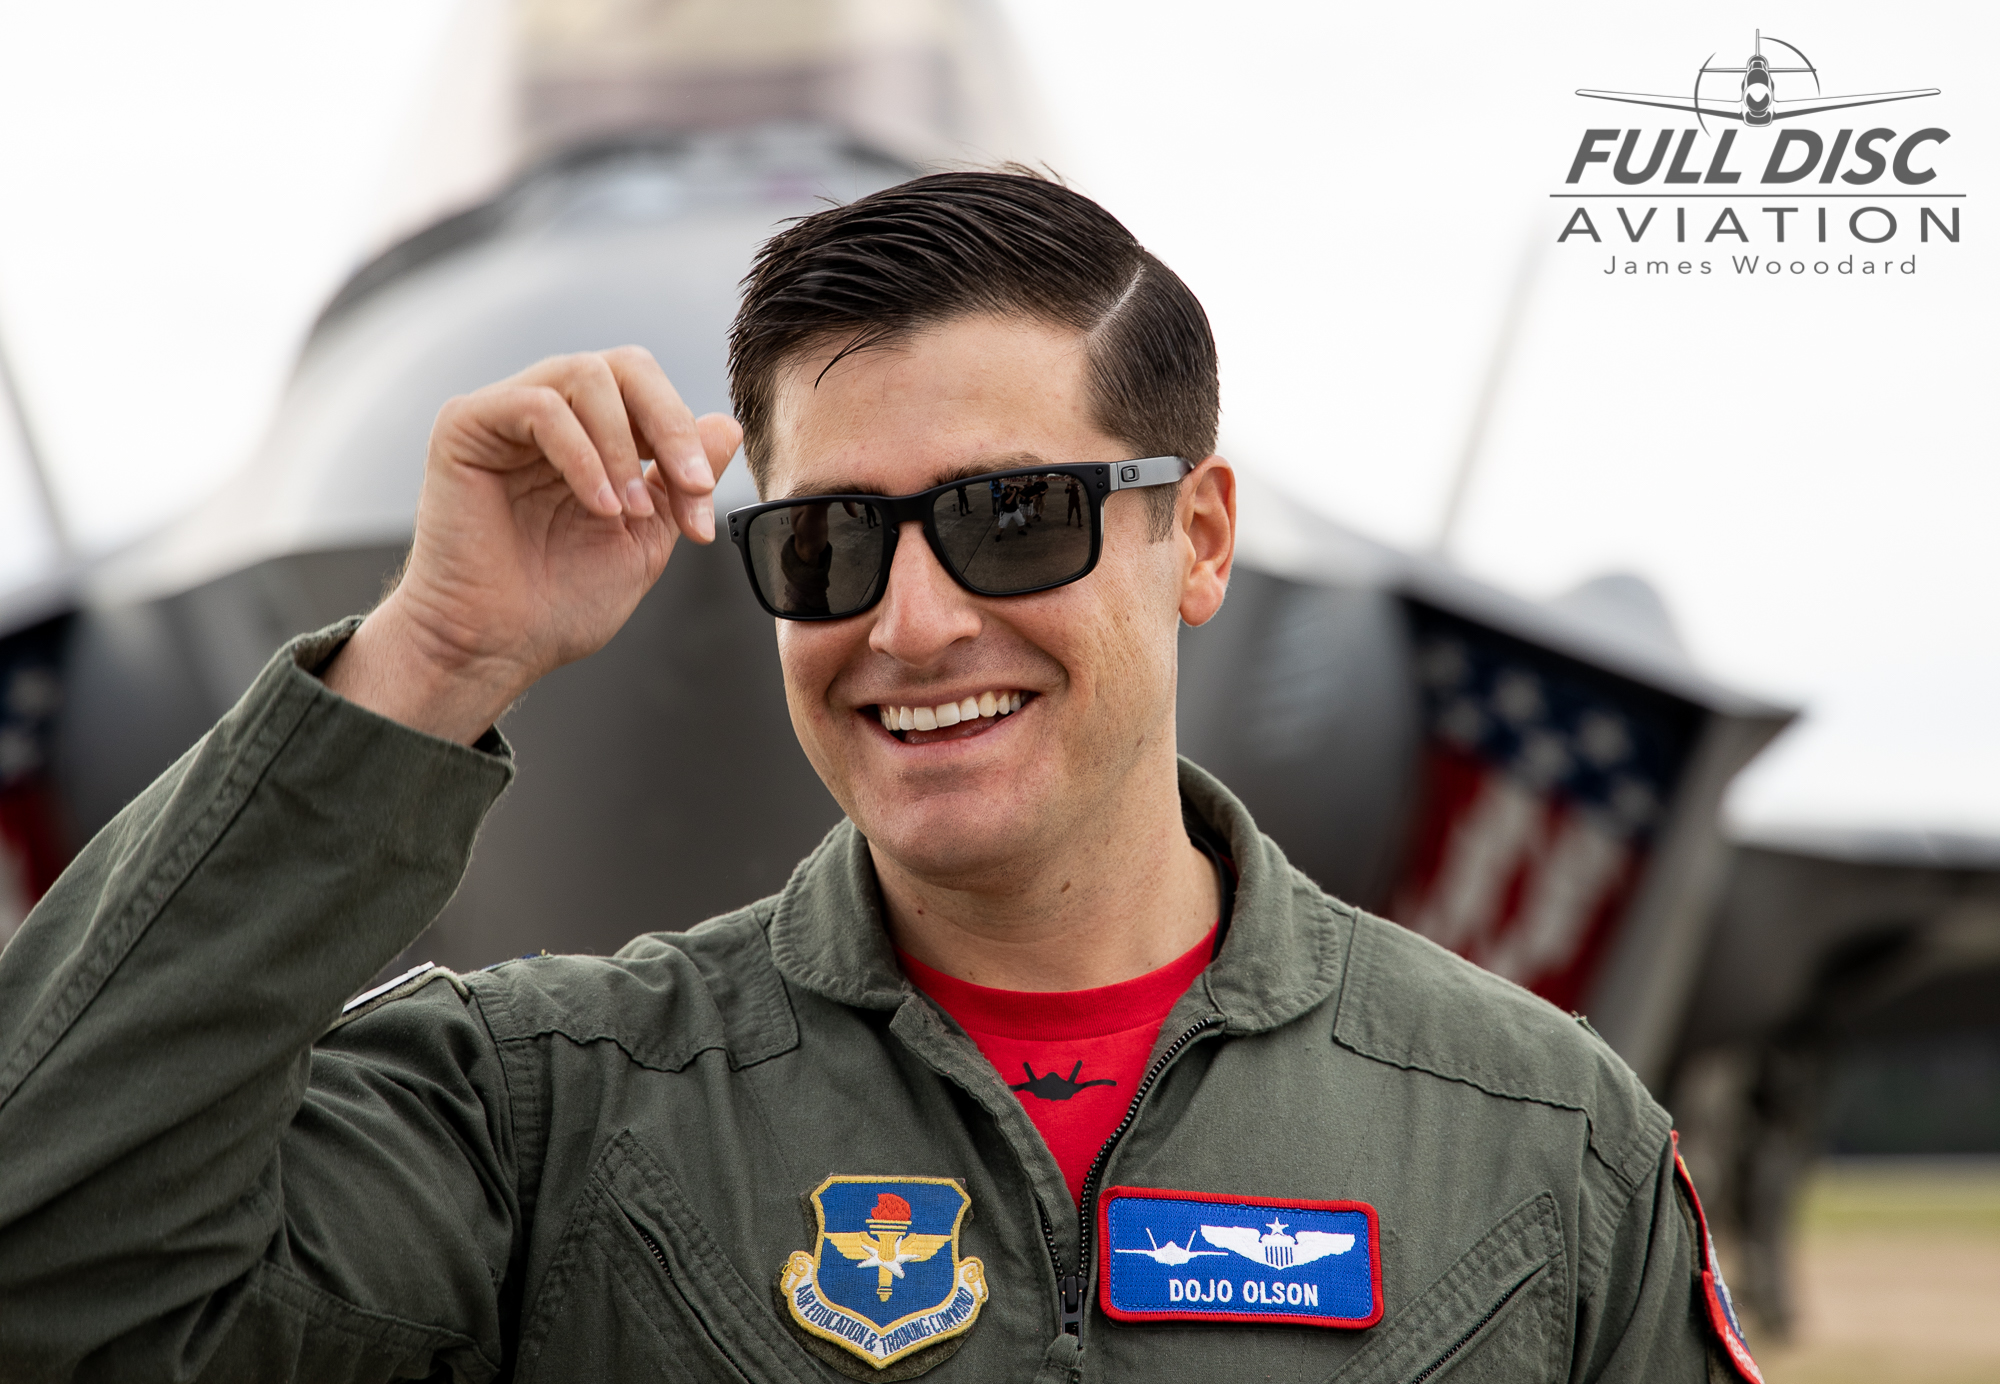 F35DemoTeam_FullDiscAviation_JamesWoodard-April 28, 2019-10.jpg